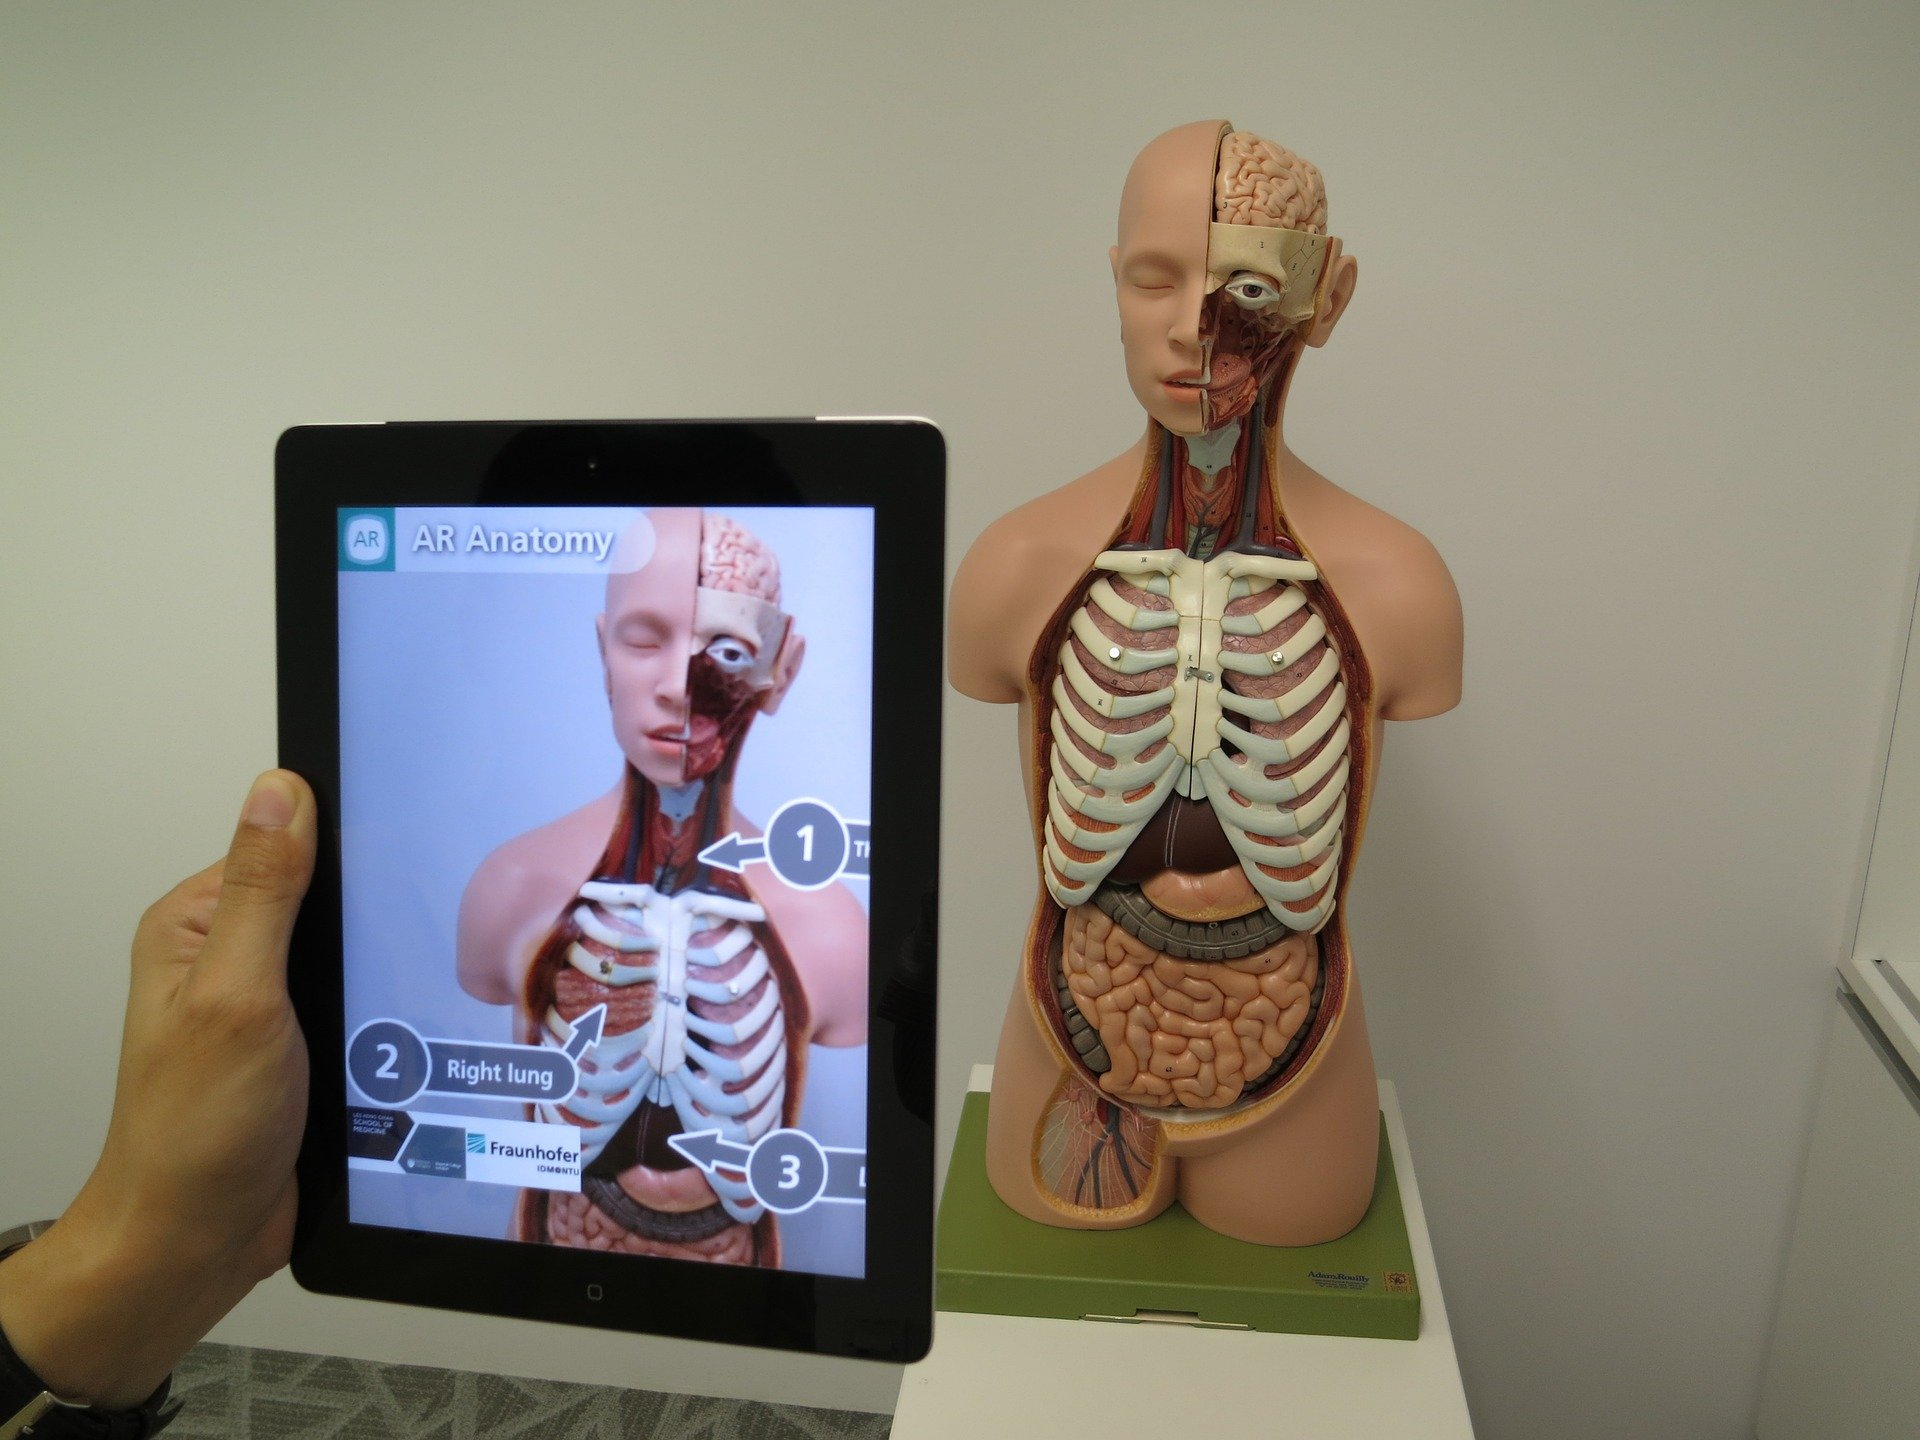 medicina holograma